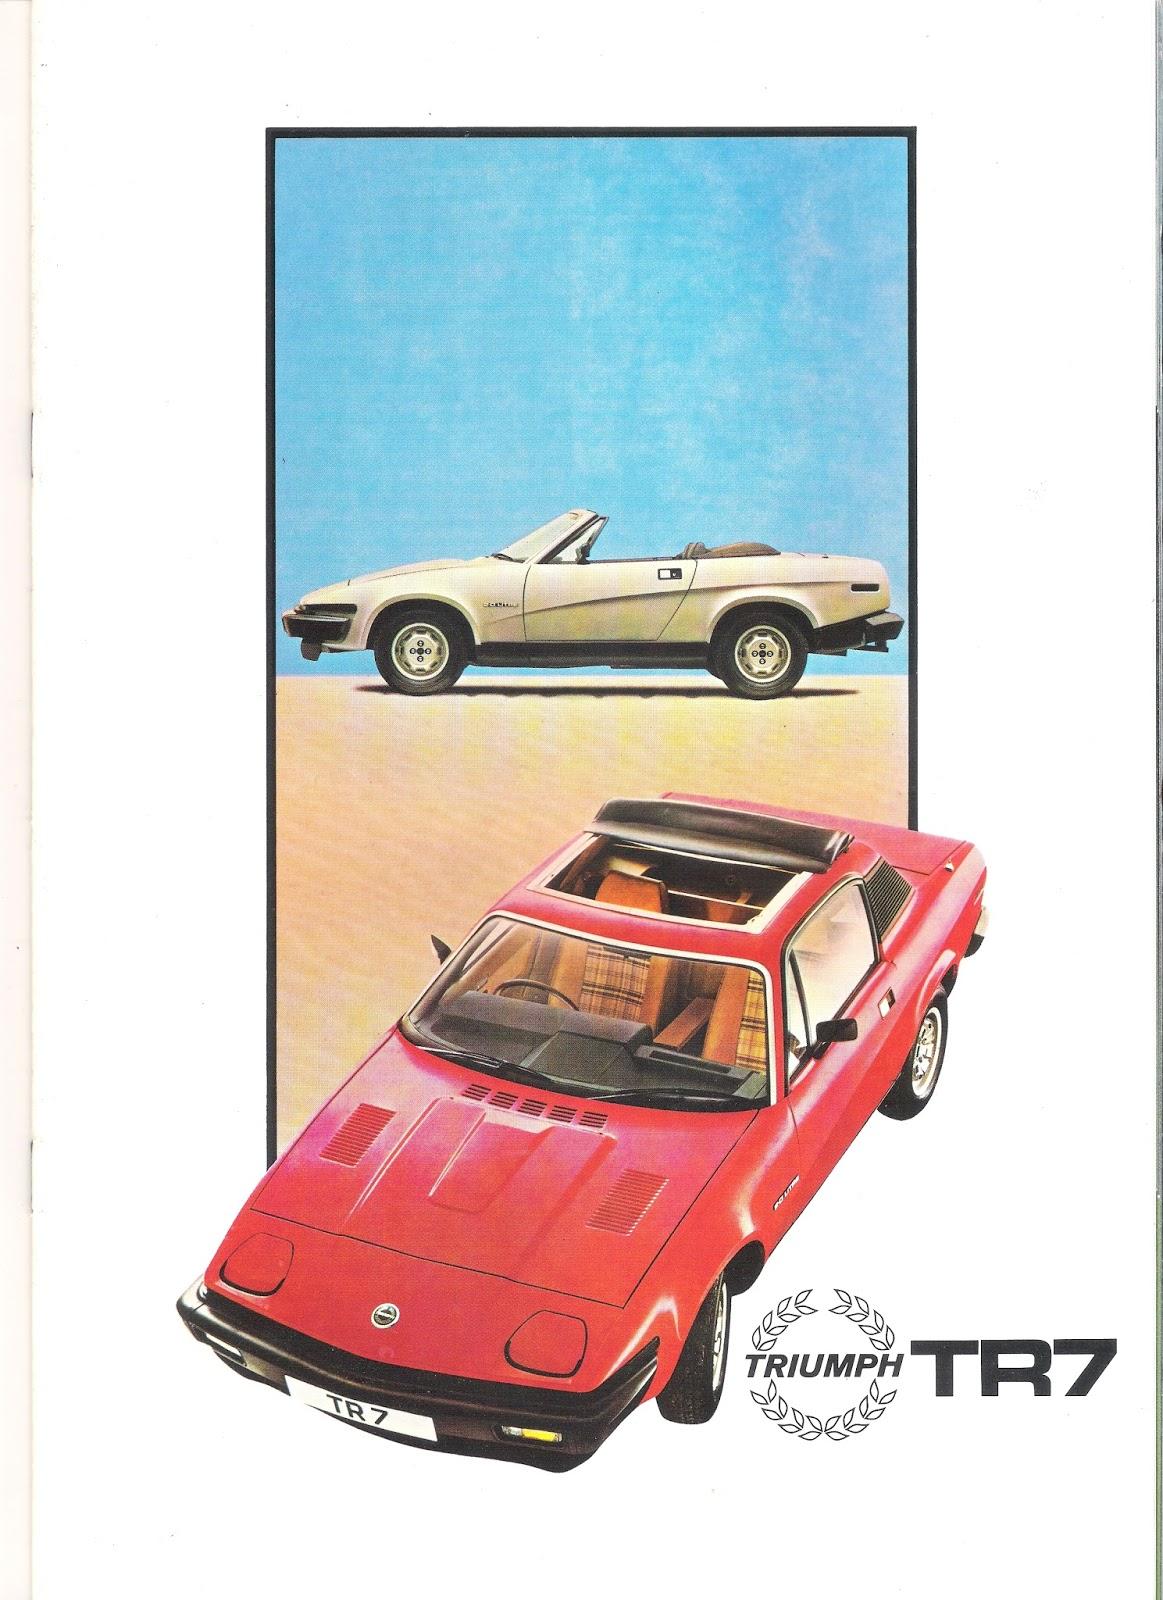 Triumph TR7 brochure front cover